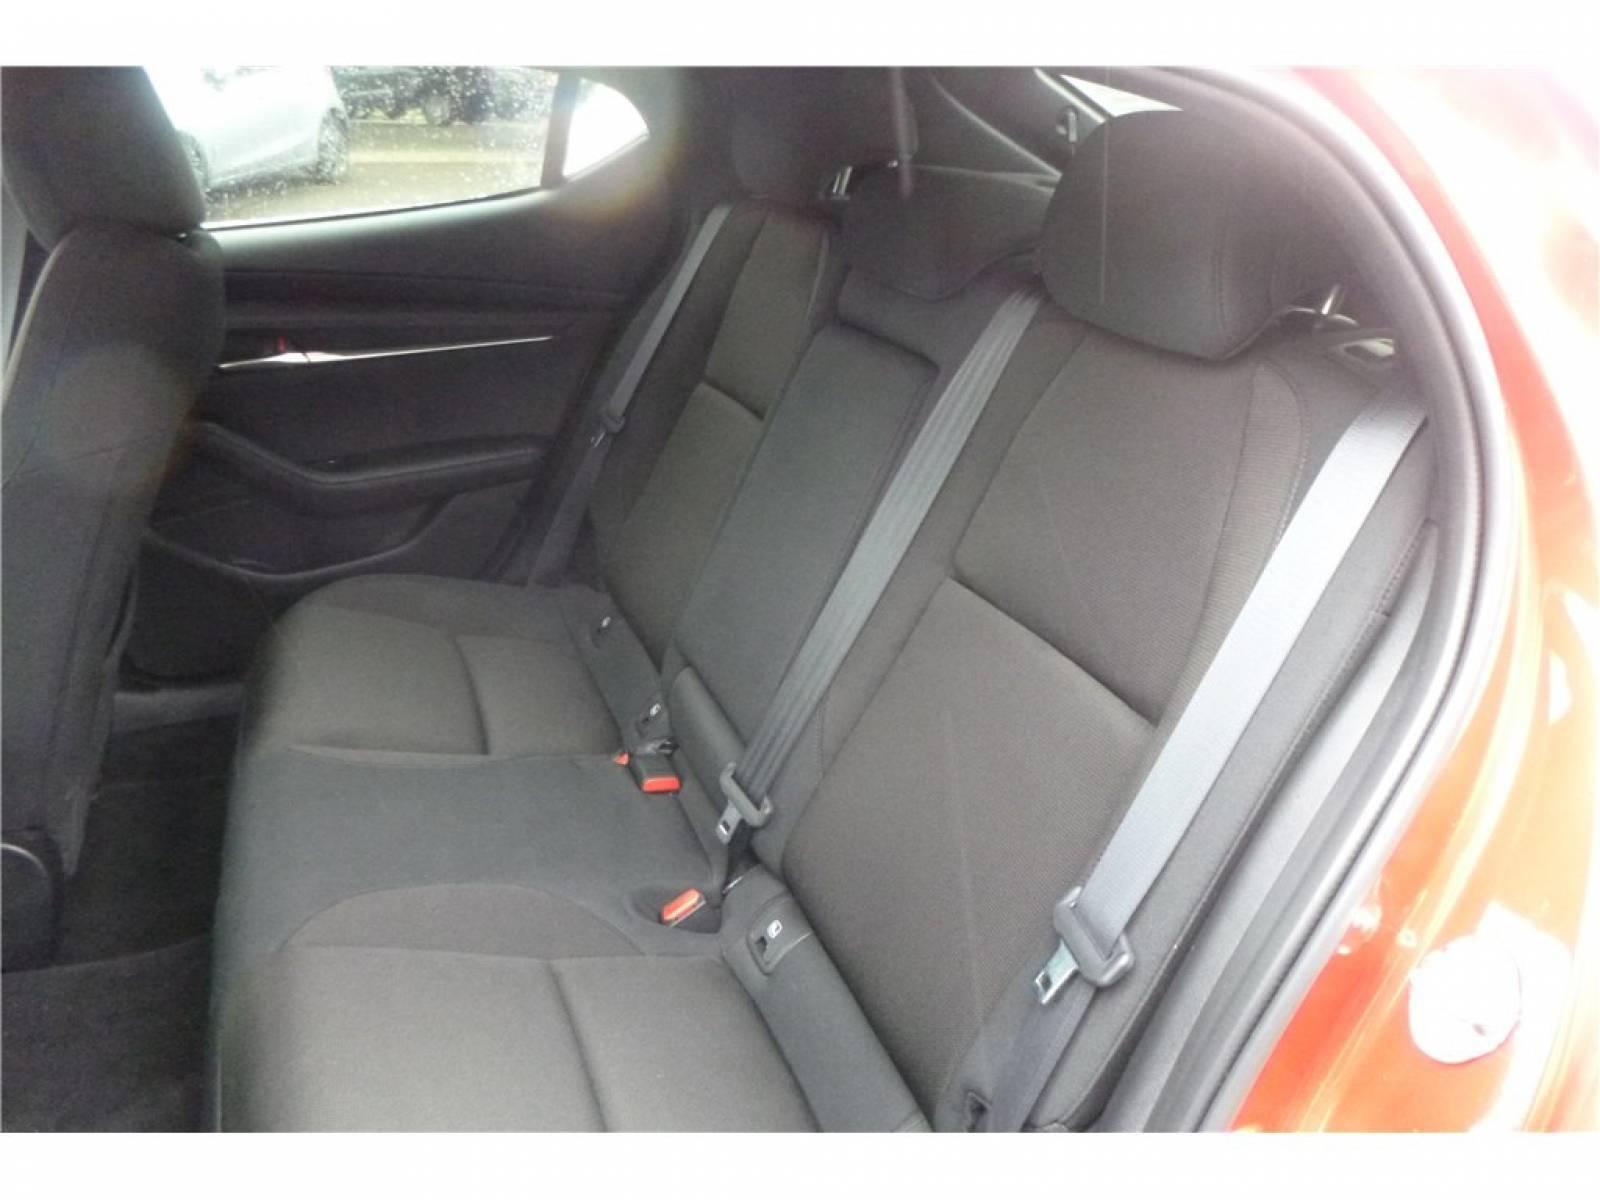 MAZDA Mazda3 5 portes 2.0L SKYACTIV-G M Hybrid 122 ch BVA6 - véhicule d'occasion - Groupe Guillet - Chalon Automobiles - 71100 - Chalon-sur-Saône - 10